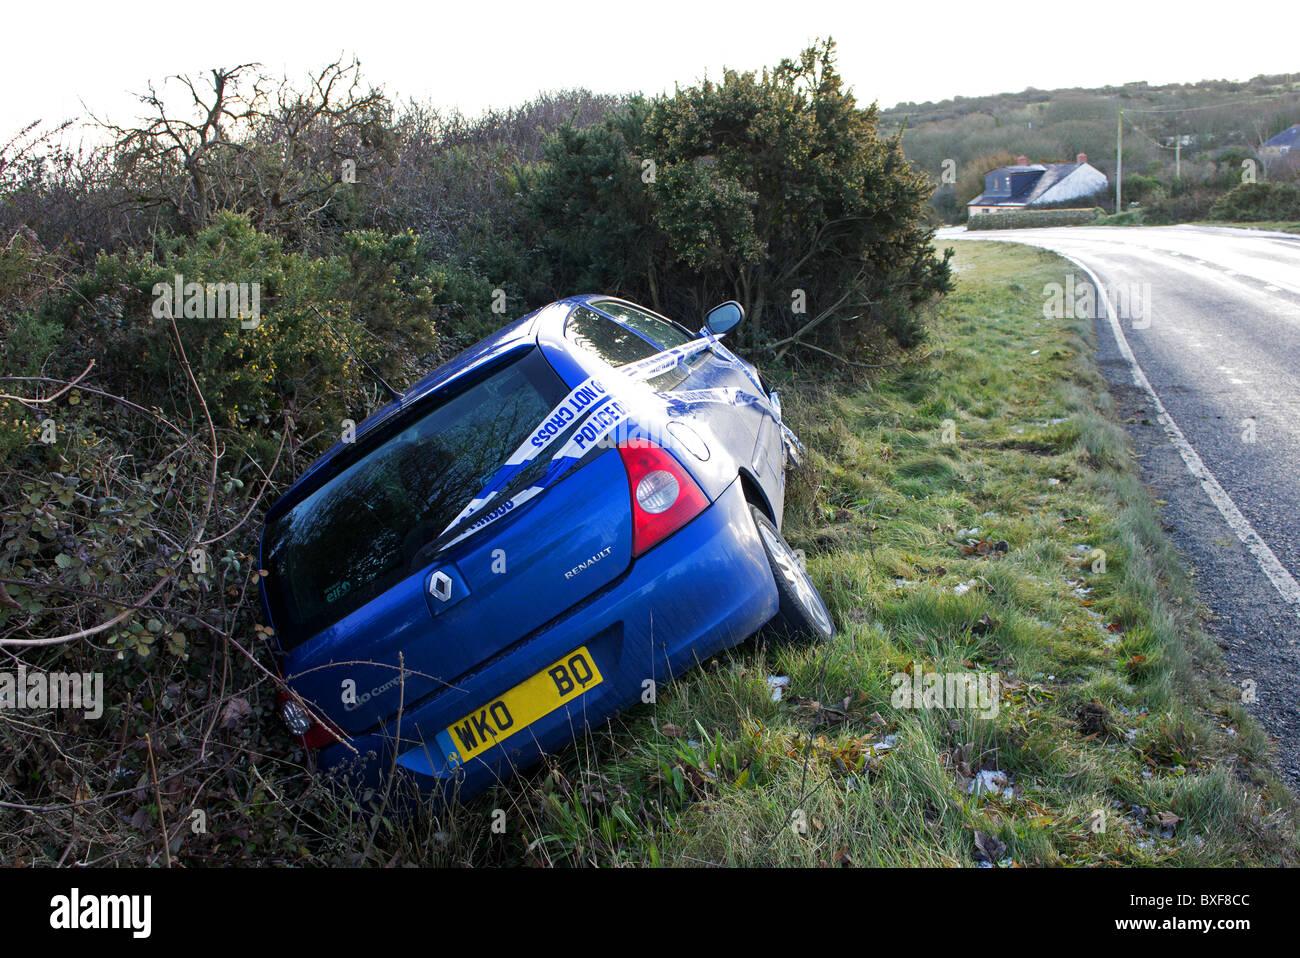 a car crashed, skidded on ice on a country lane, uk - Stock Image